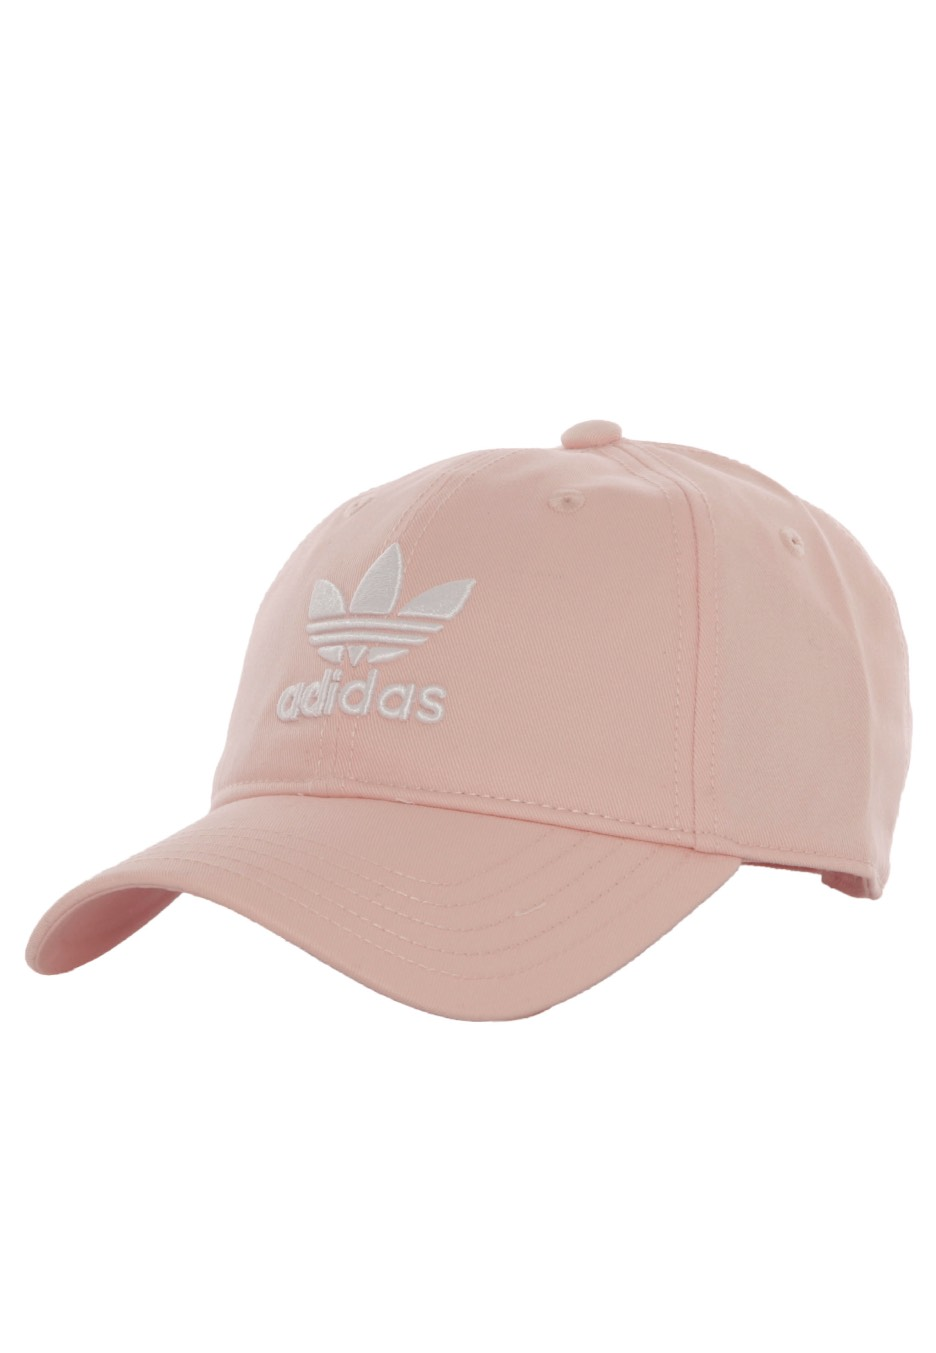 Adidas - Trefoil Blush Pink - Cap - Streetwear Shop - Impericon.com  Worldwide b1f17251e1d